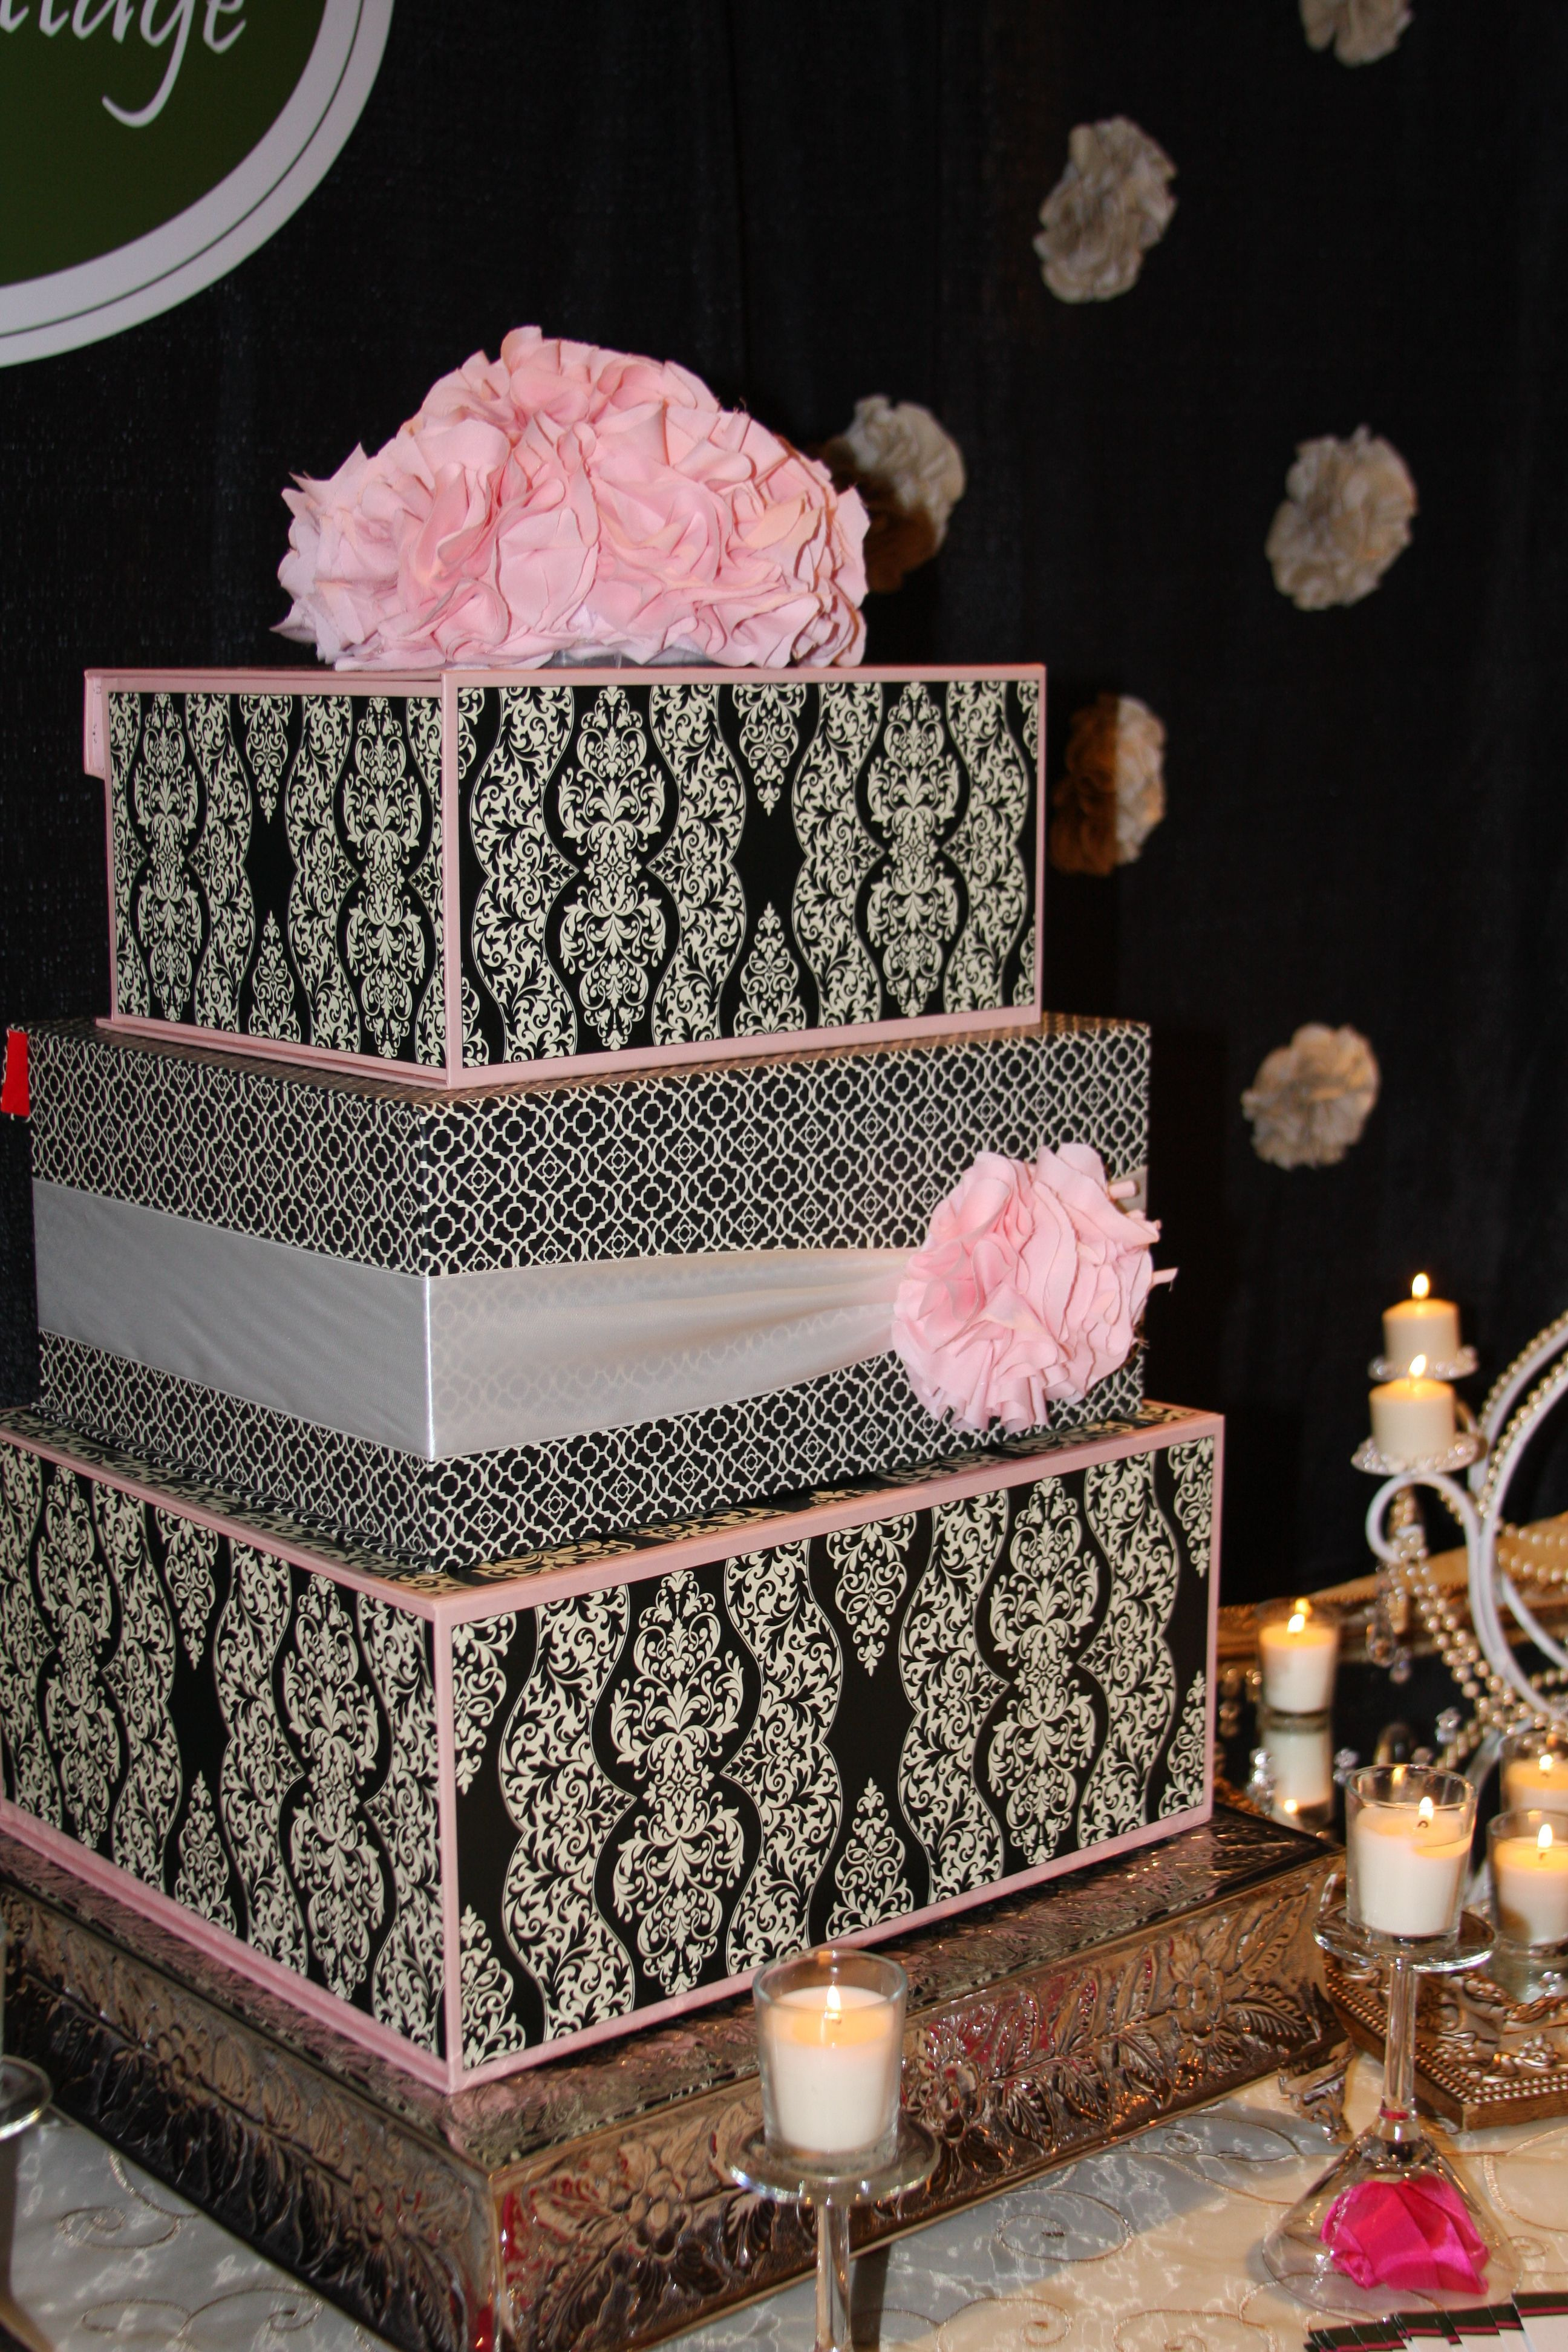 Card Box Ideas Wedding Cake: Card Box Wedding Cake Ideas At Websimilar.org